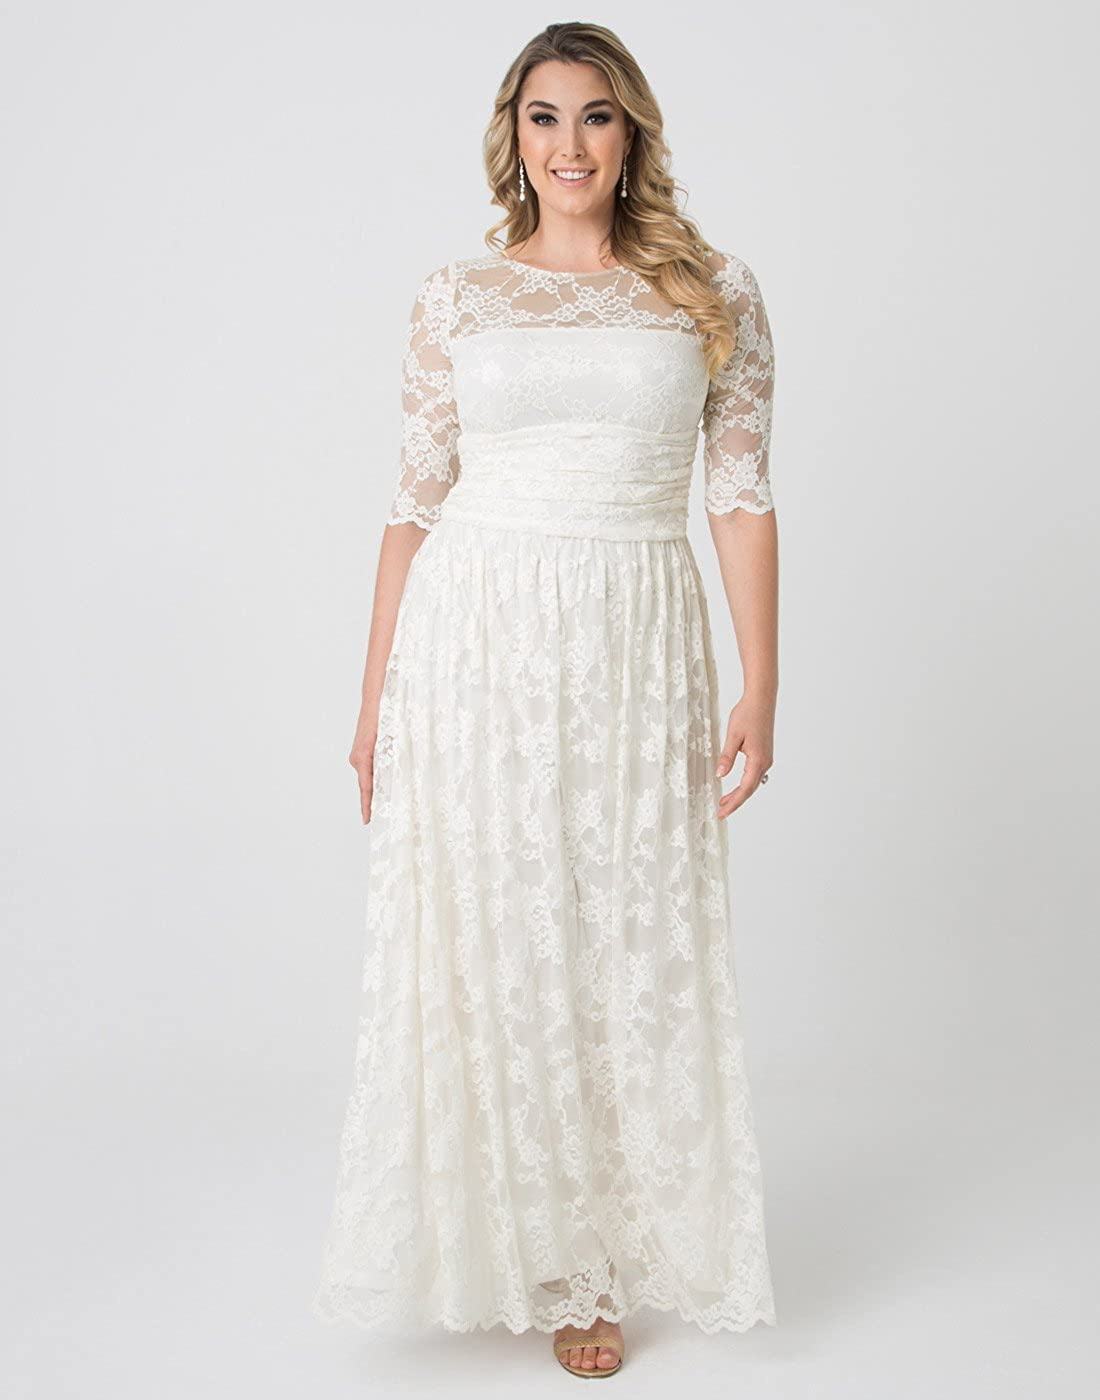 Kiyonna Womens Plus Size Lace Illusion Wedding Gown